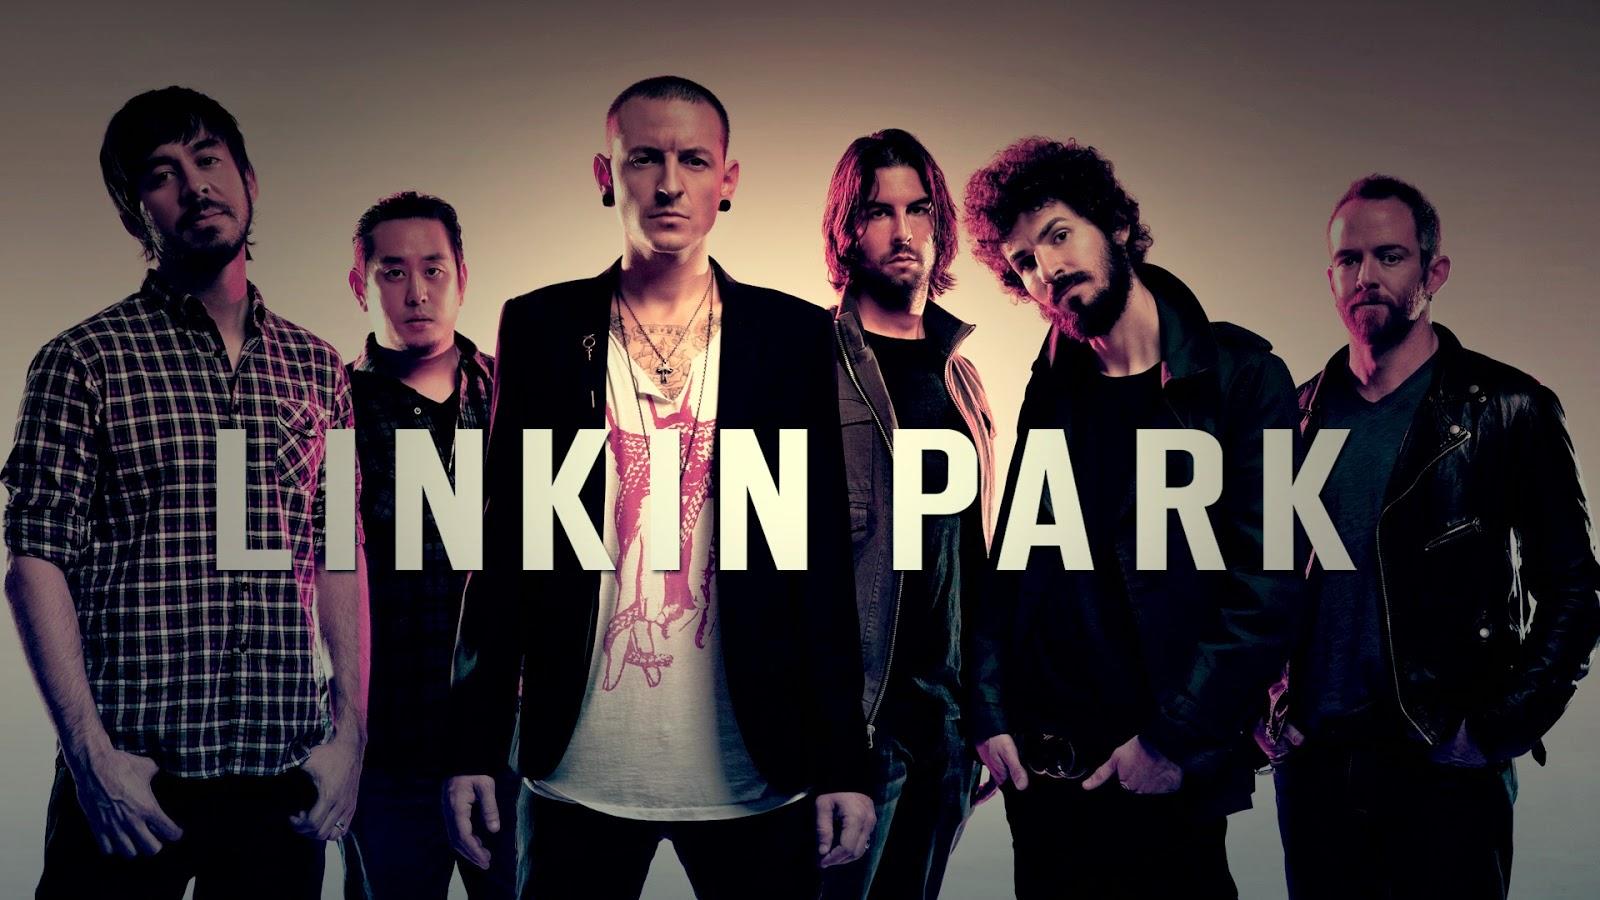 Download [Mp3]-[All Album] รวมเพลงจากทุก Album ของ Linkin park มากกว่า 180 เพลง [Solidfiles] 4shared By Pleng-mun.com